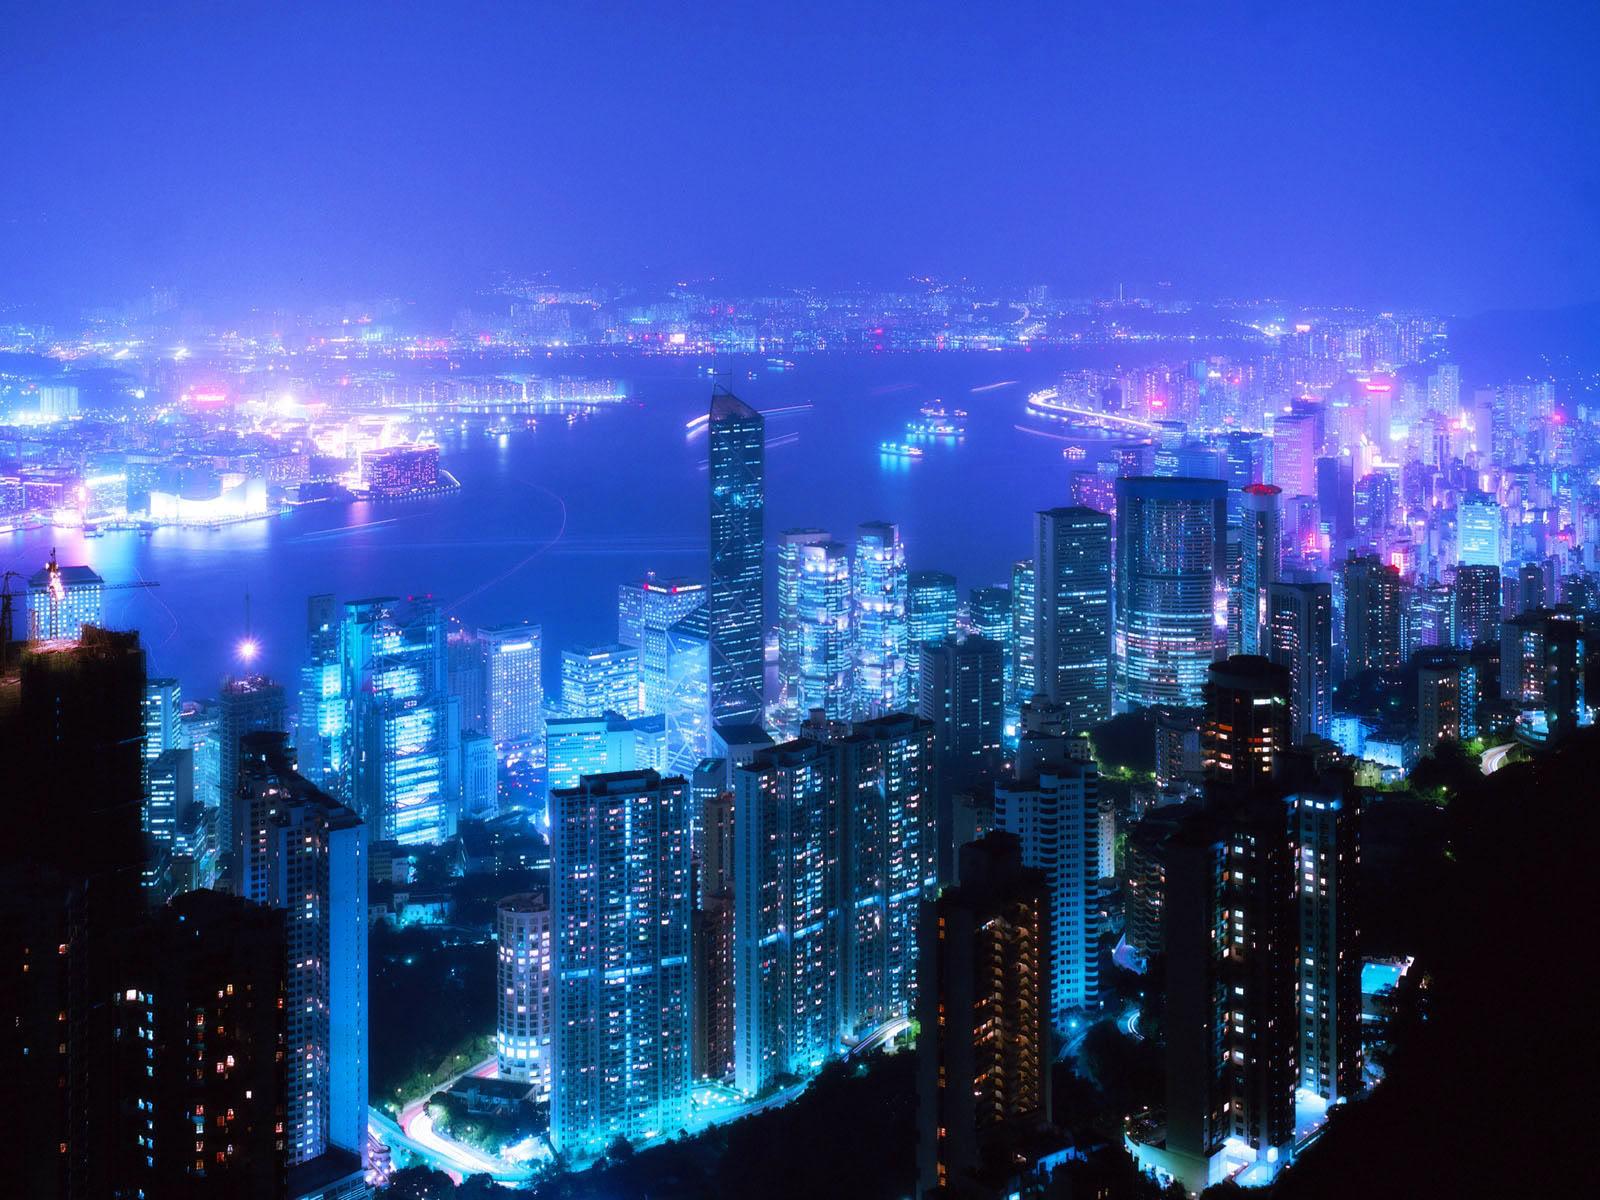 Desktop Fun Cities at Night Wallpaper Collection Series 1 1600x1200